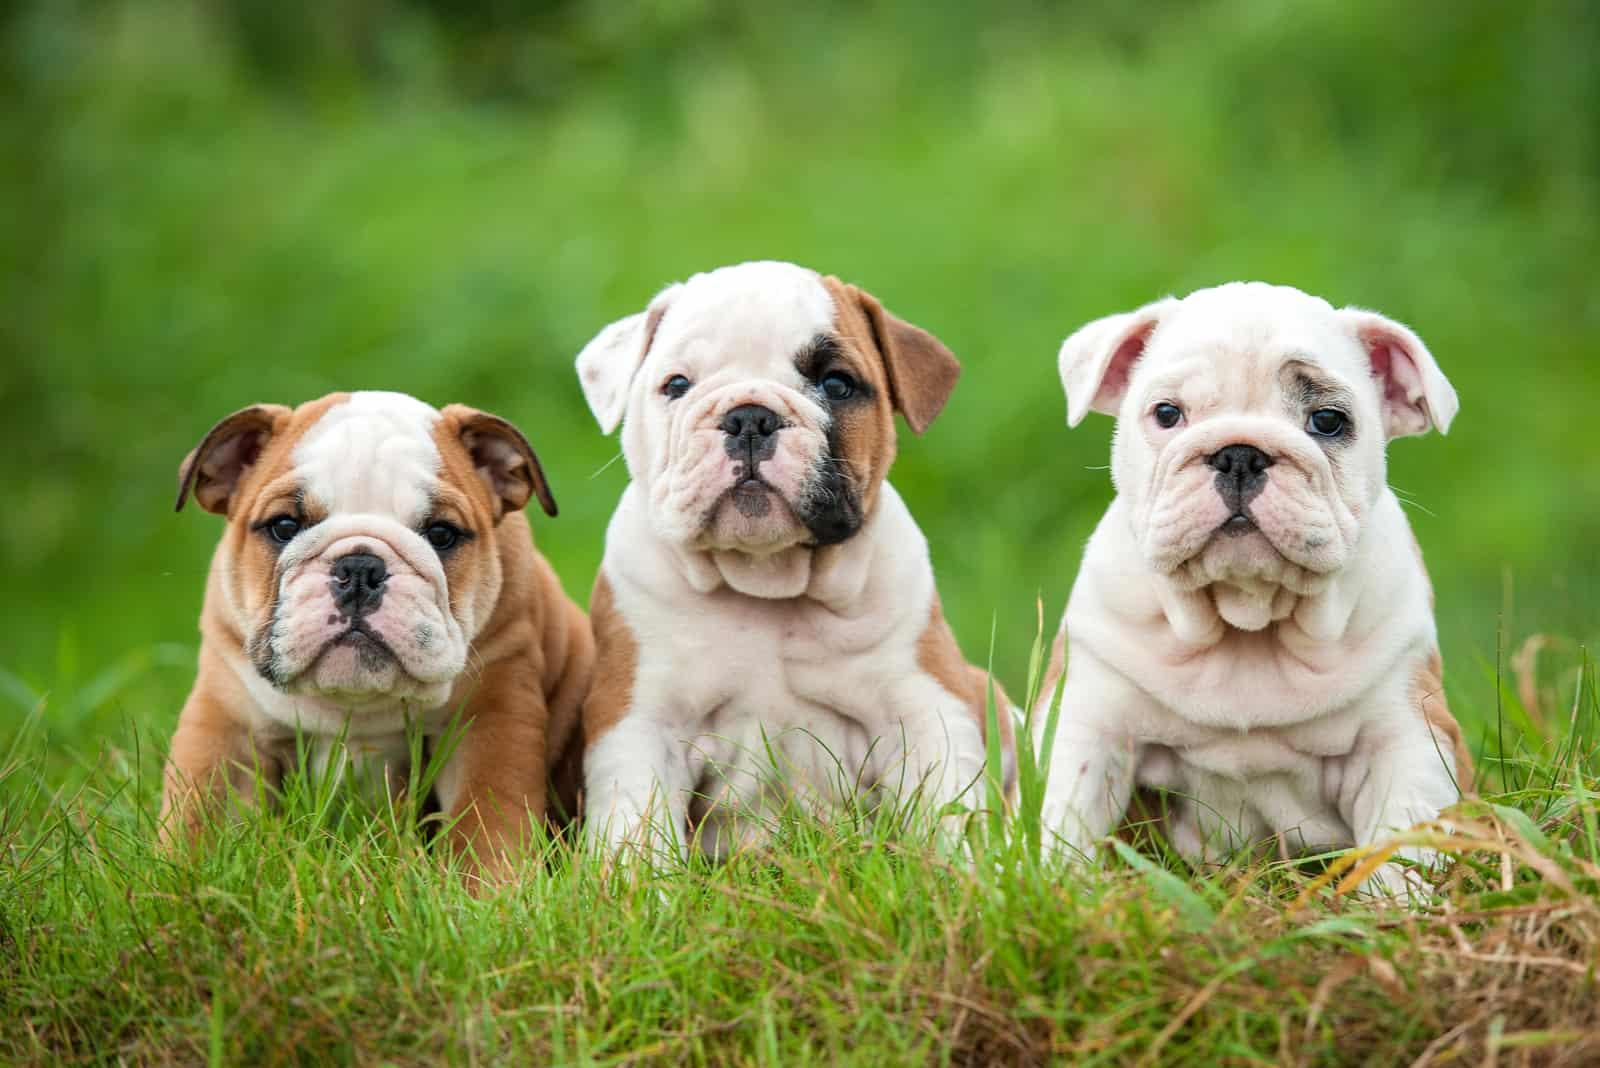 Three english bulldog puppies sitting on the grass